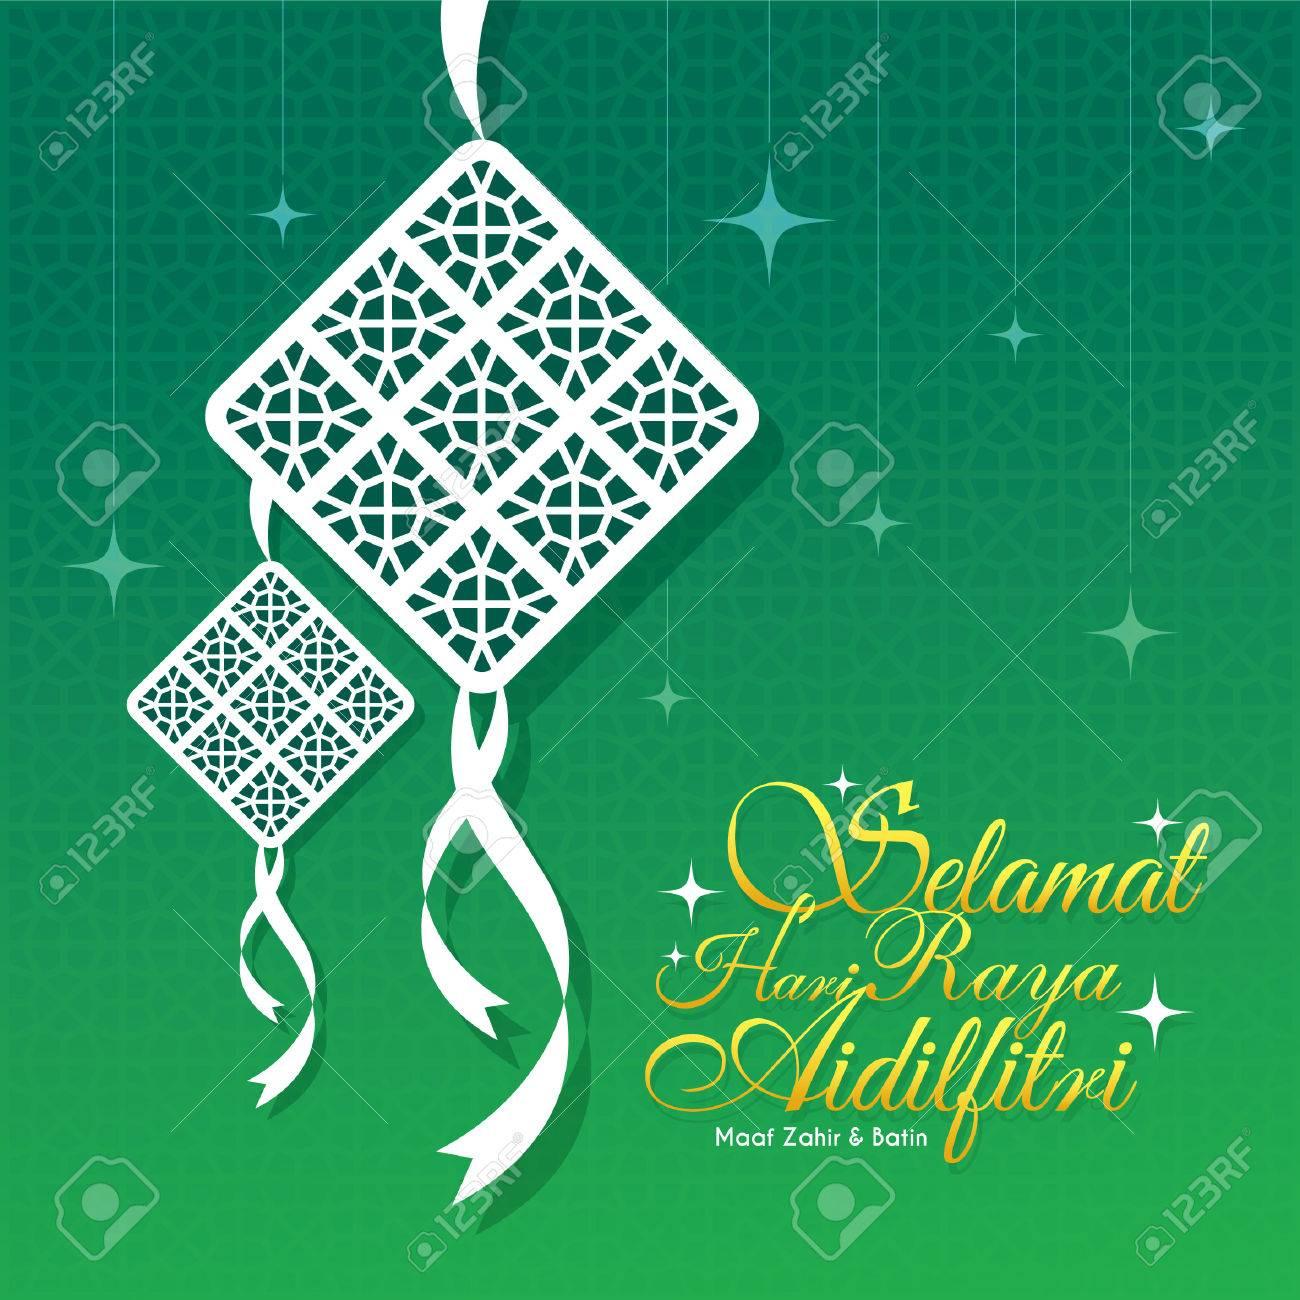 Hari raya aidilfitri greeting card vector ketupat with starry hari raya aidilfitri greeting card vector ketupat with starry islamic pattern as background kristyandbryce Images